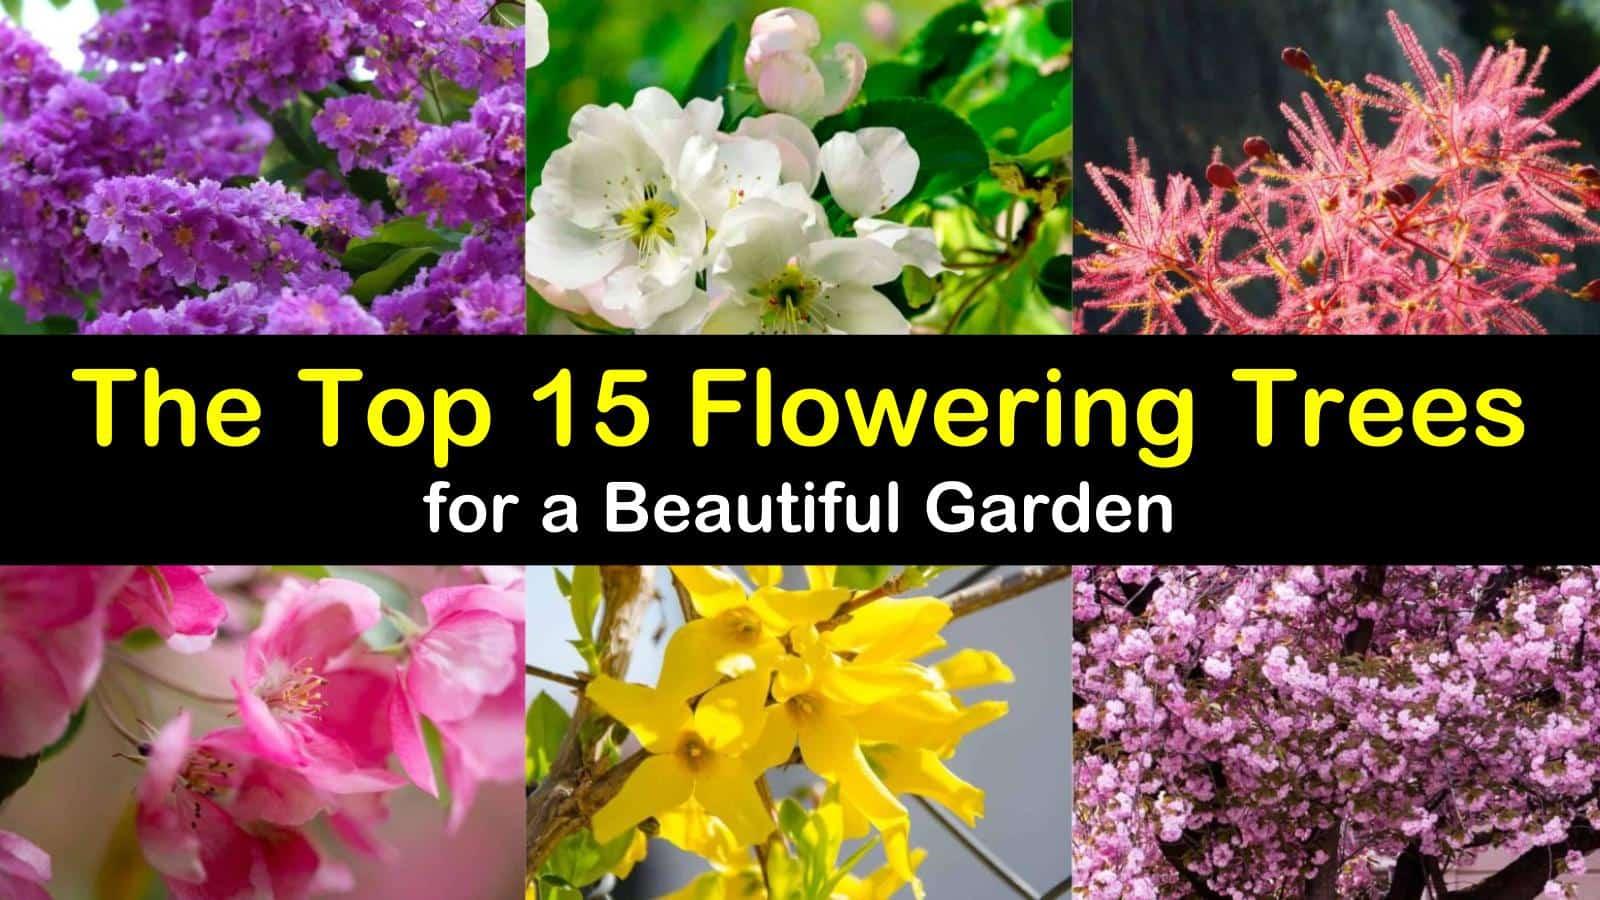 flowering trees titleimg1